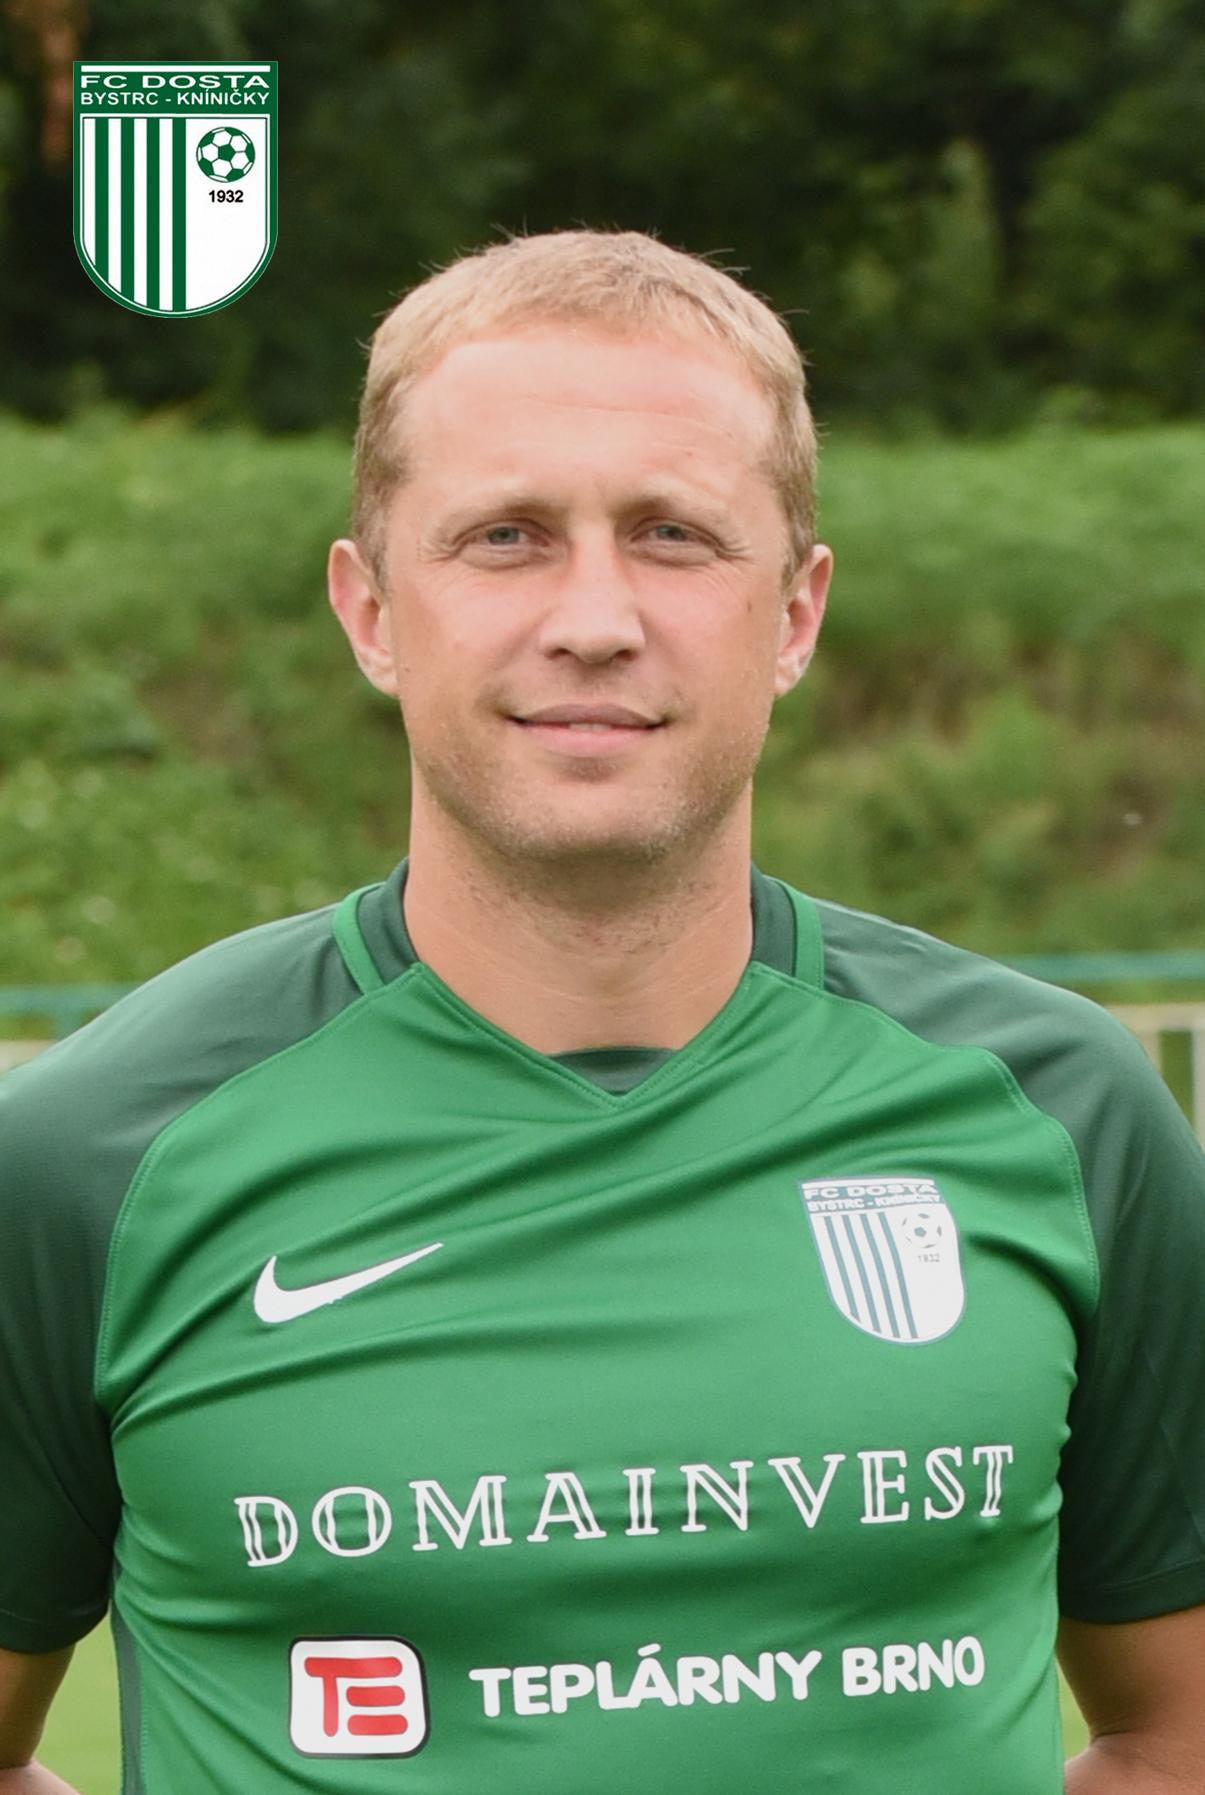 Tomáš Buriánek